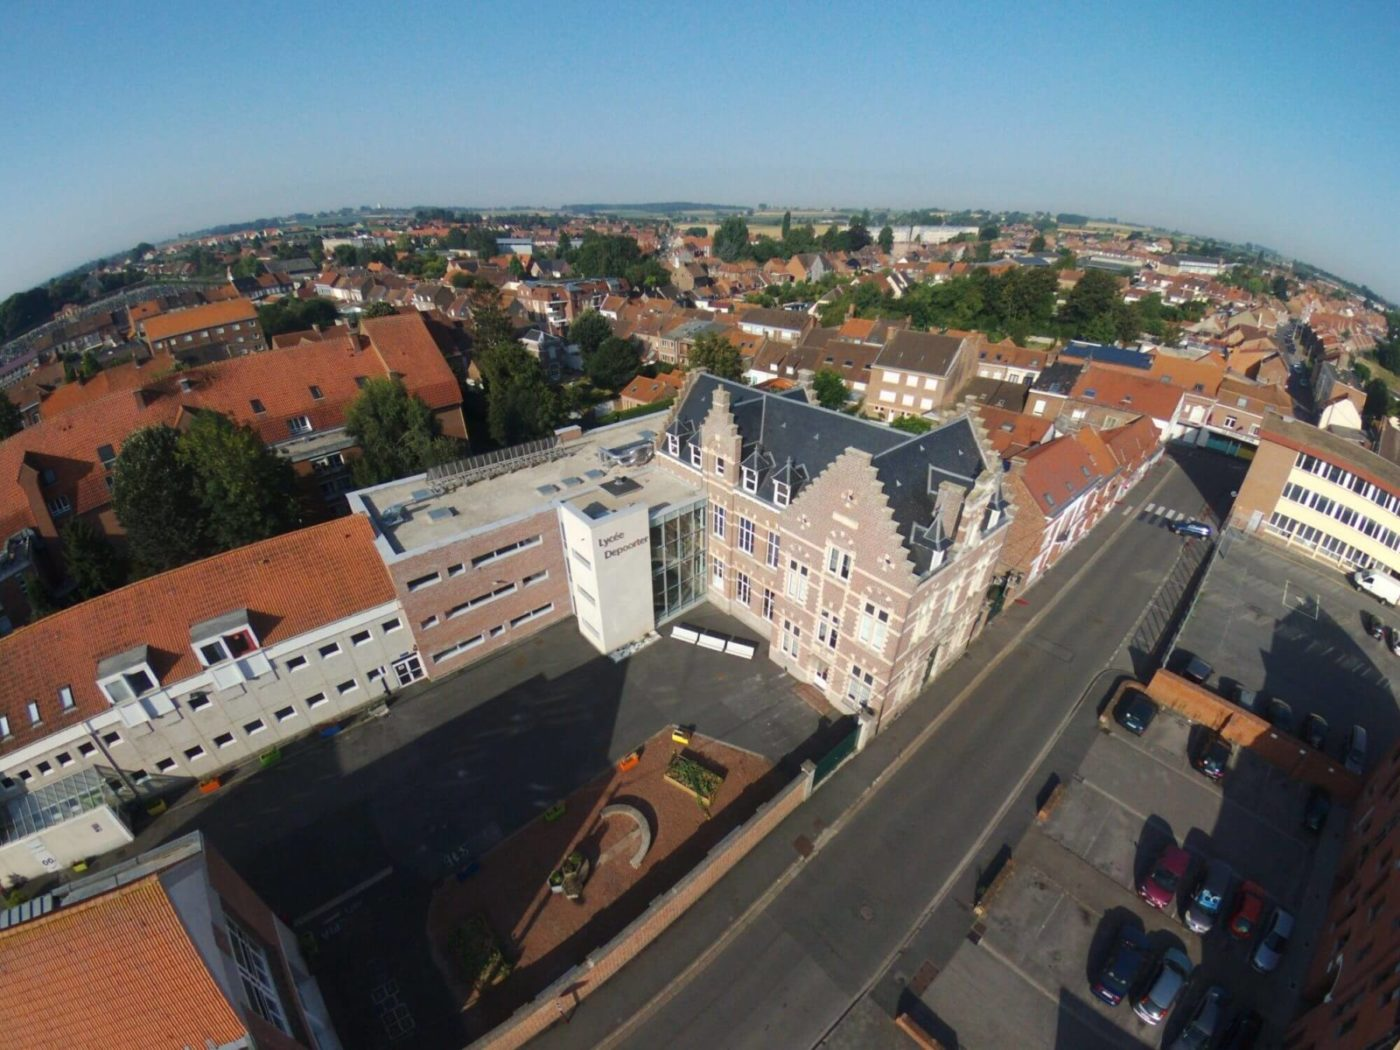 Couverture Ardoise Lycée Depoorter à Hazebrouck